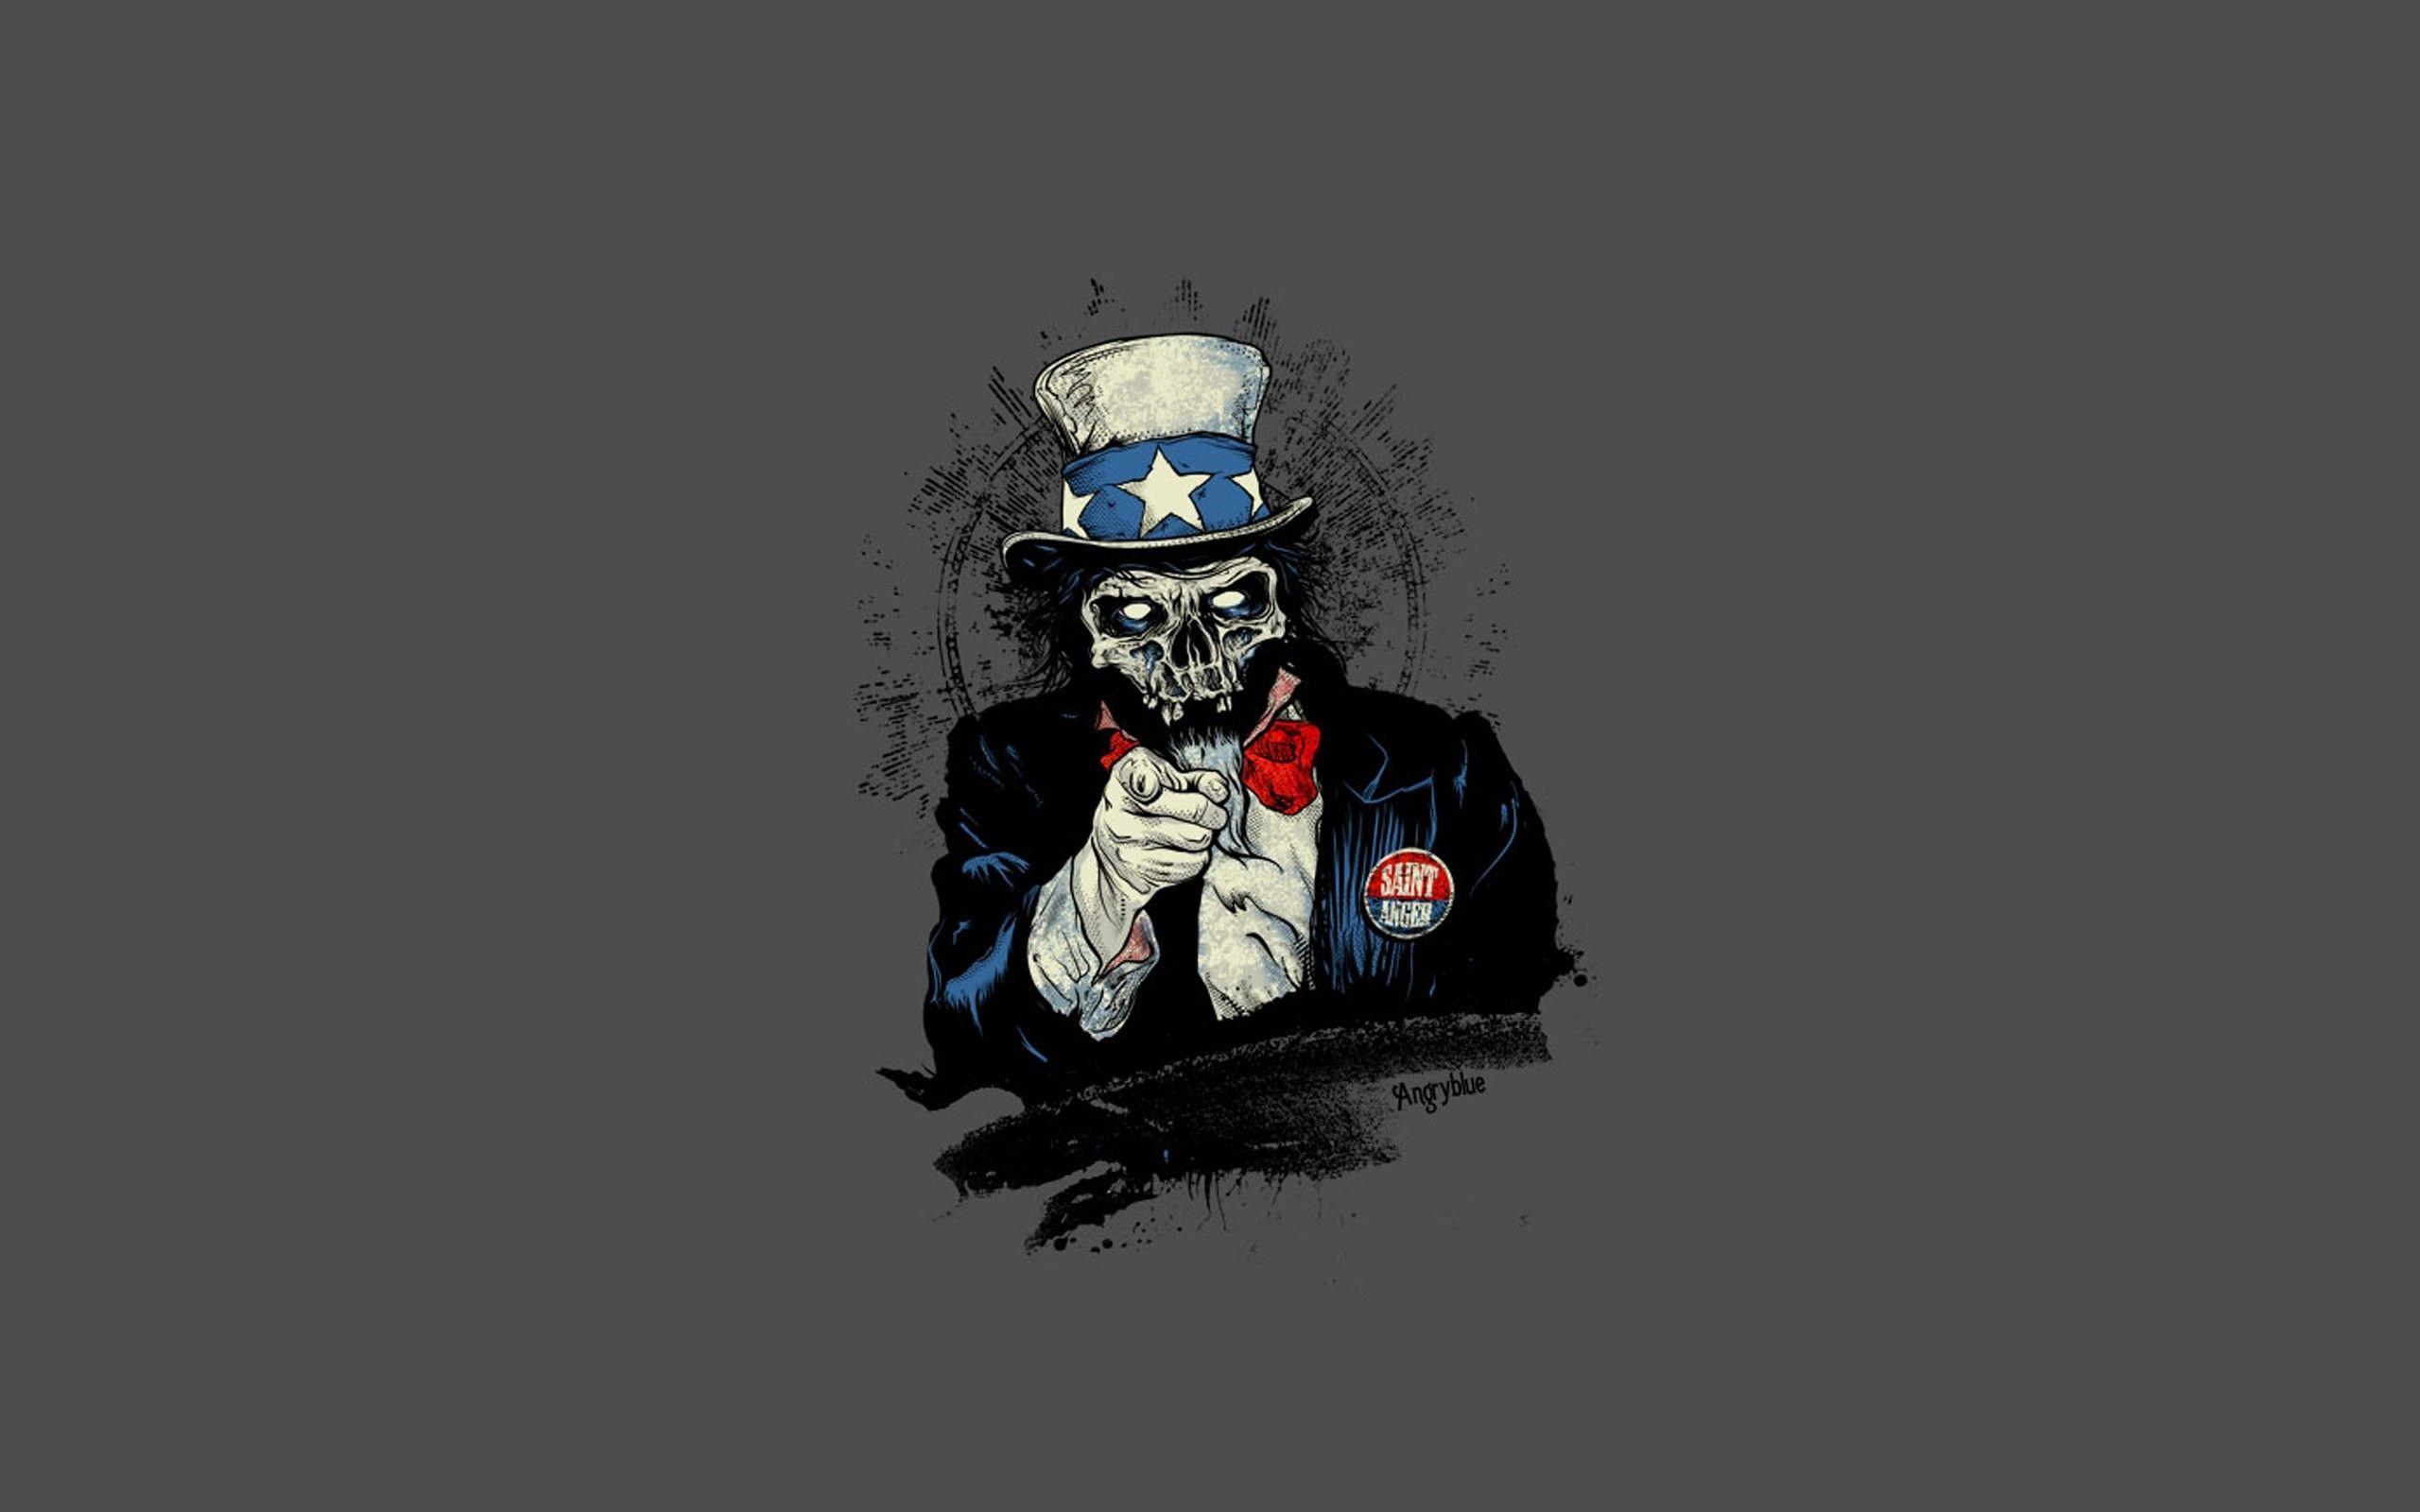 Dark skull skulls humor sadic wallpaper | 2560x1600 ...